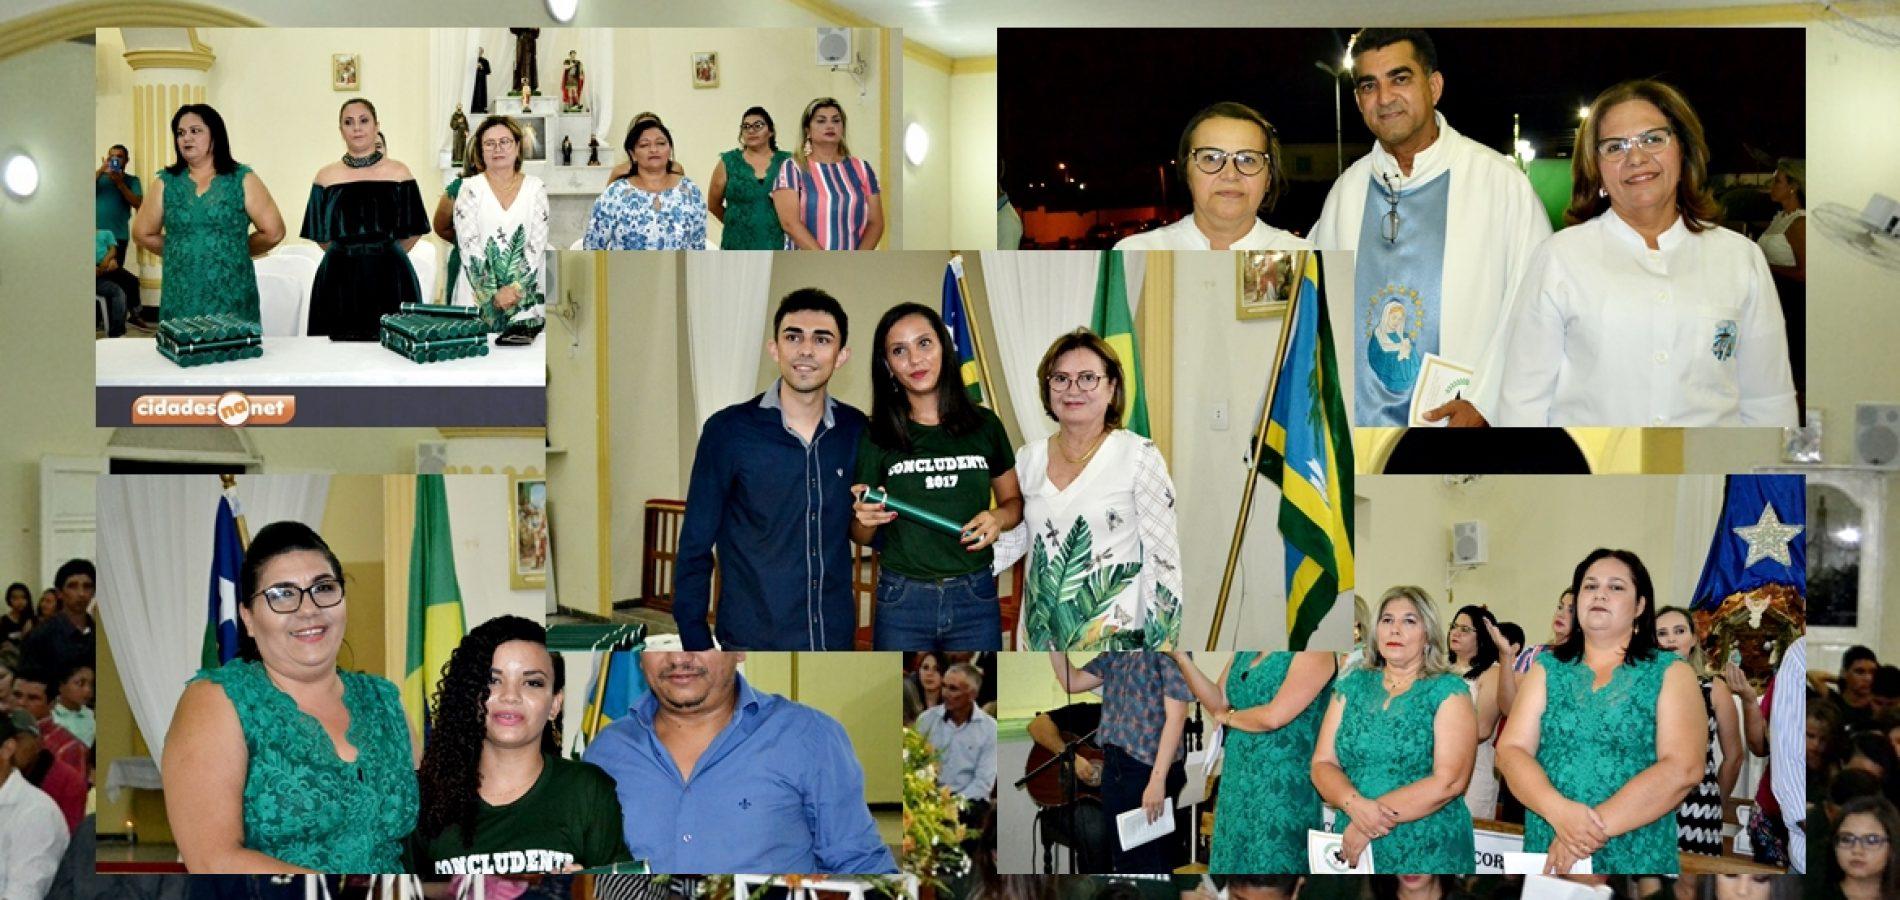 FOTOS | Missa e solenidade de entrega de certificados dos alunos concludentes do Ensino Fundamental II em Fronteiras